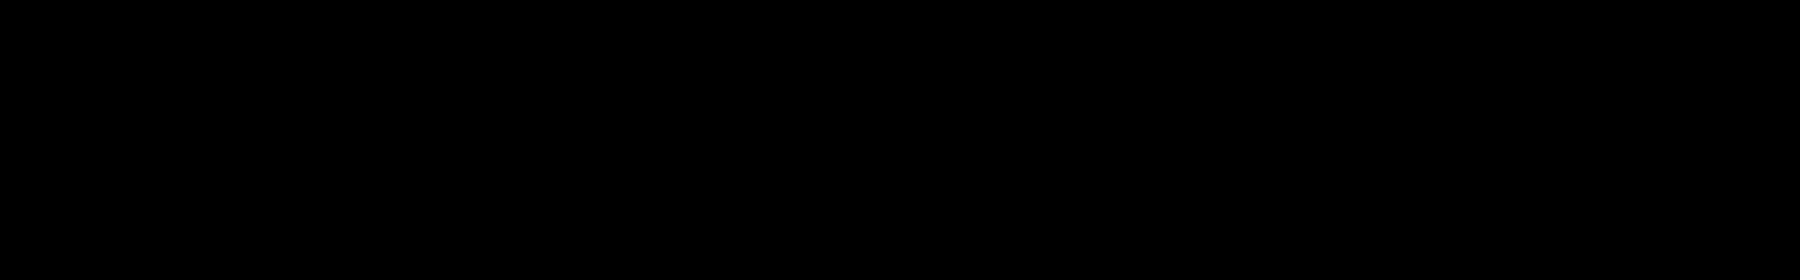 Spider (Ableton Live Template) audio waveform